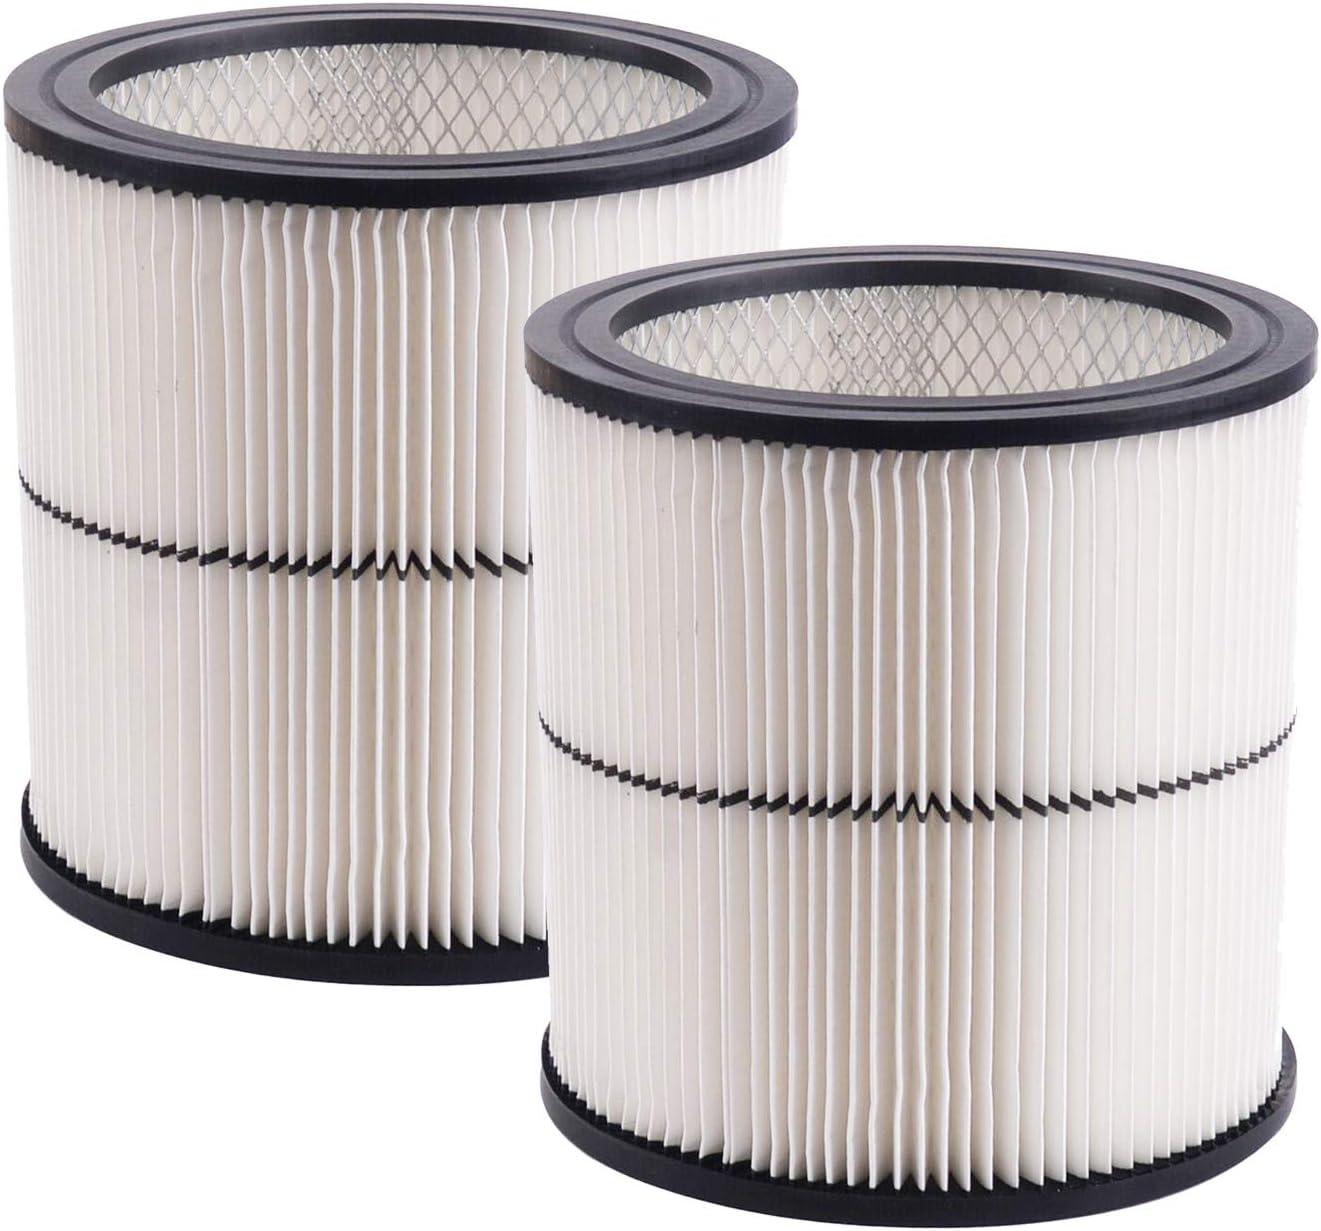 Carkio 17884 Vacuum Filter compatible with Craftsman 9-17884 17920 17921 17922 17923 17929 17935 17937 Cartridge Shop Vac Filter - 2pcs